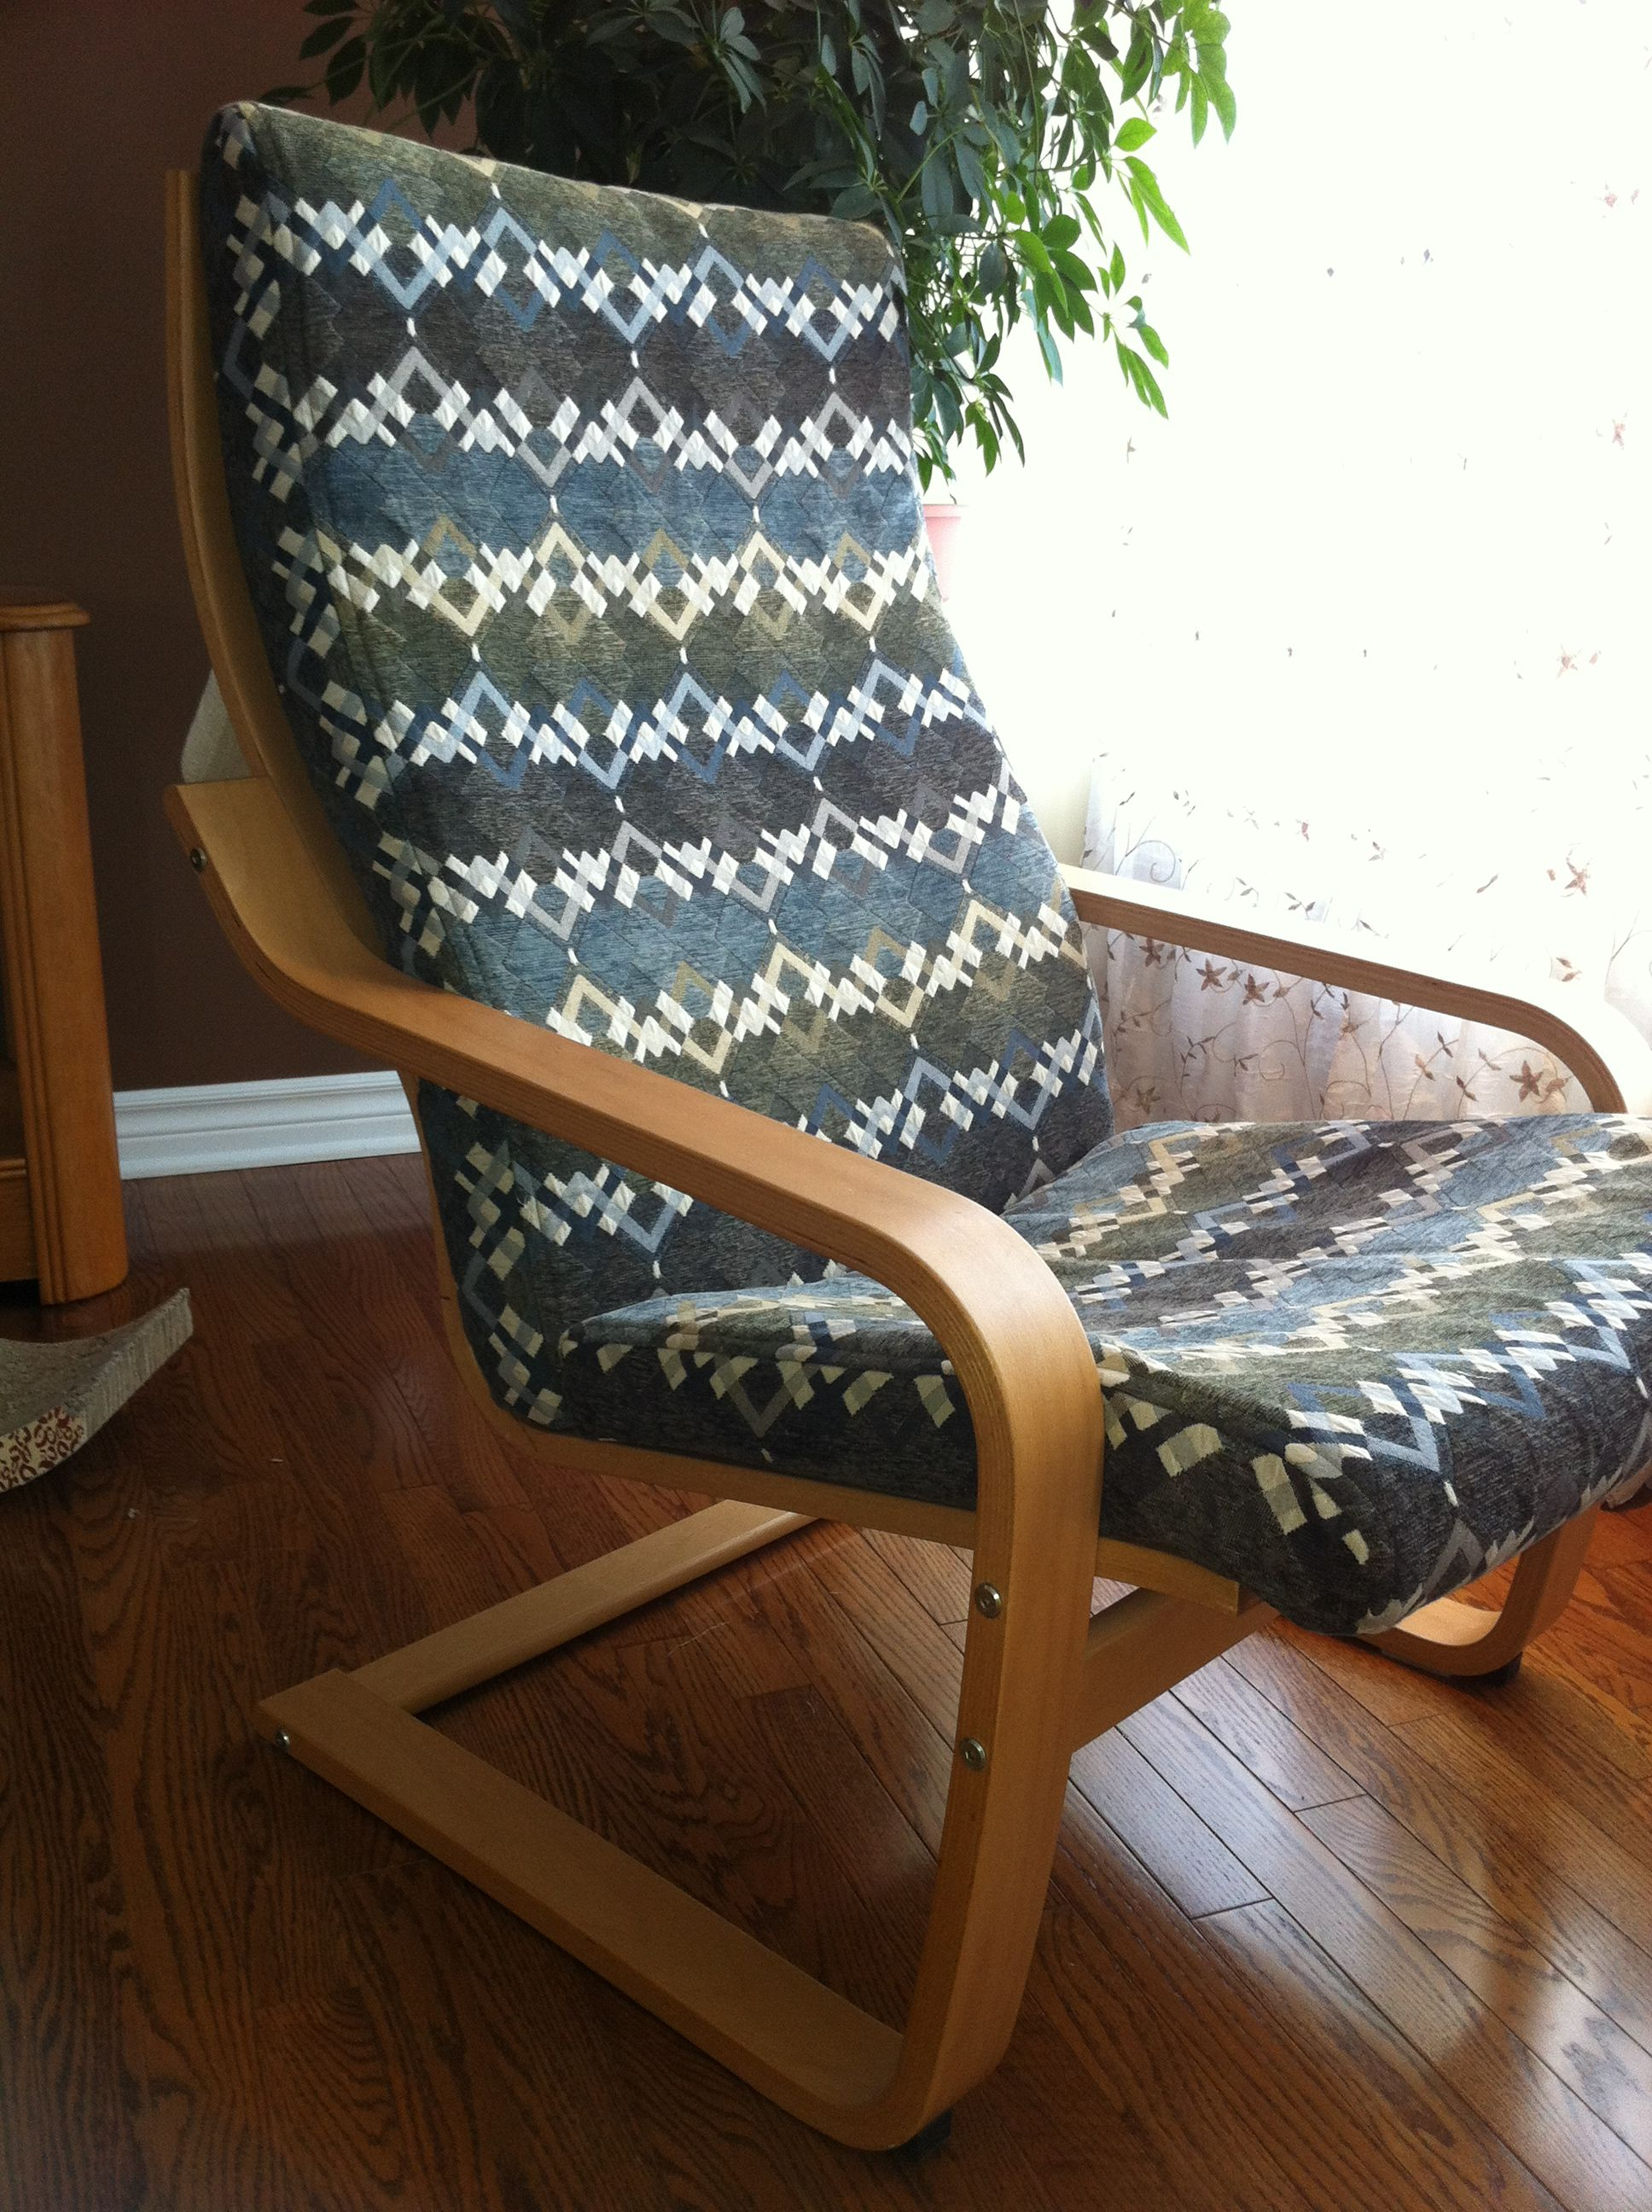 ikea poang chair covers uk fishing brolly clamp cover diy pinterest tutorial cushions cushion